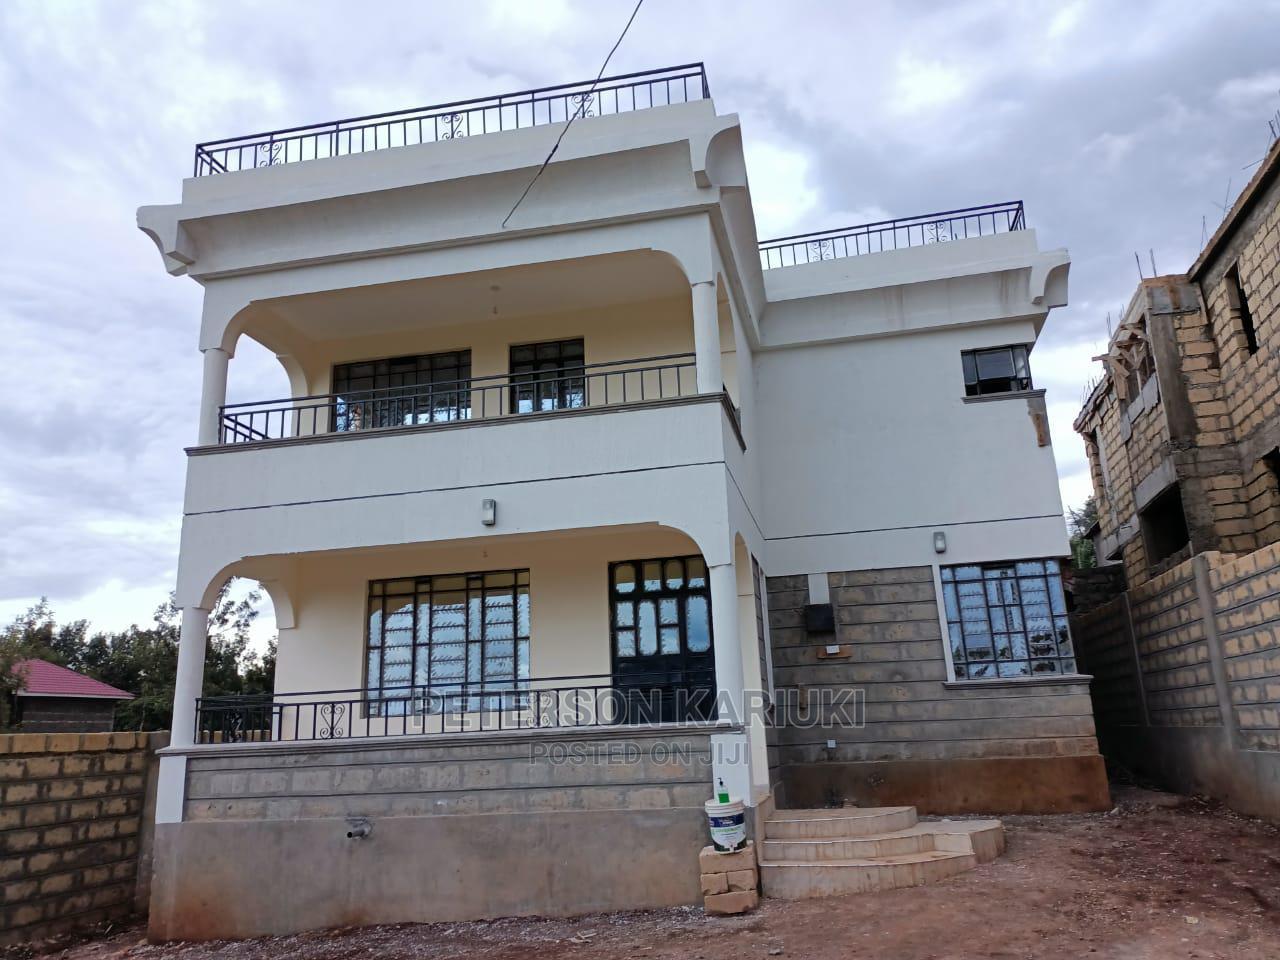 4bedrooms High End Flat Rooftop Maisonette | Houses & Apartments For Sale for sale in Kibiku, Ngong, Kenya